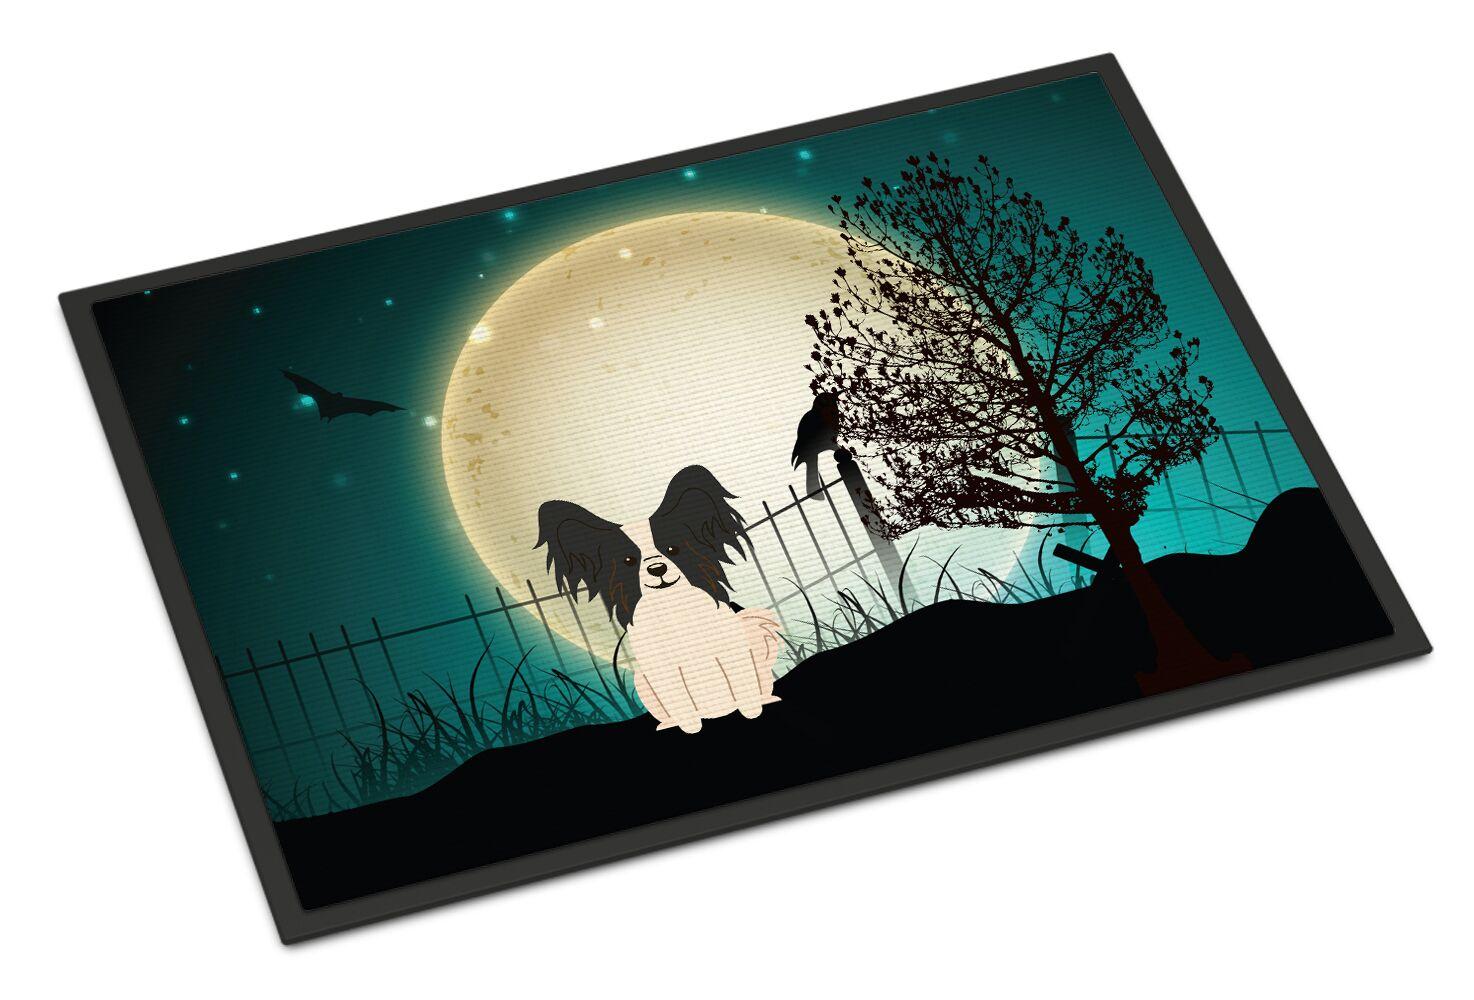 Halloween Scary Papillon Doormat Color: Black/White, Mat Size: Rectangle 2' x 3'